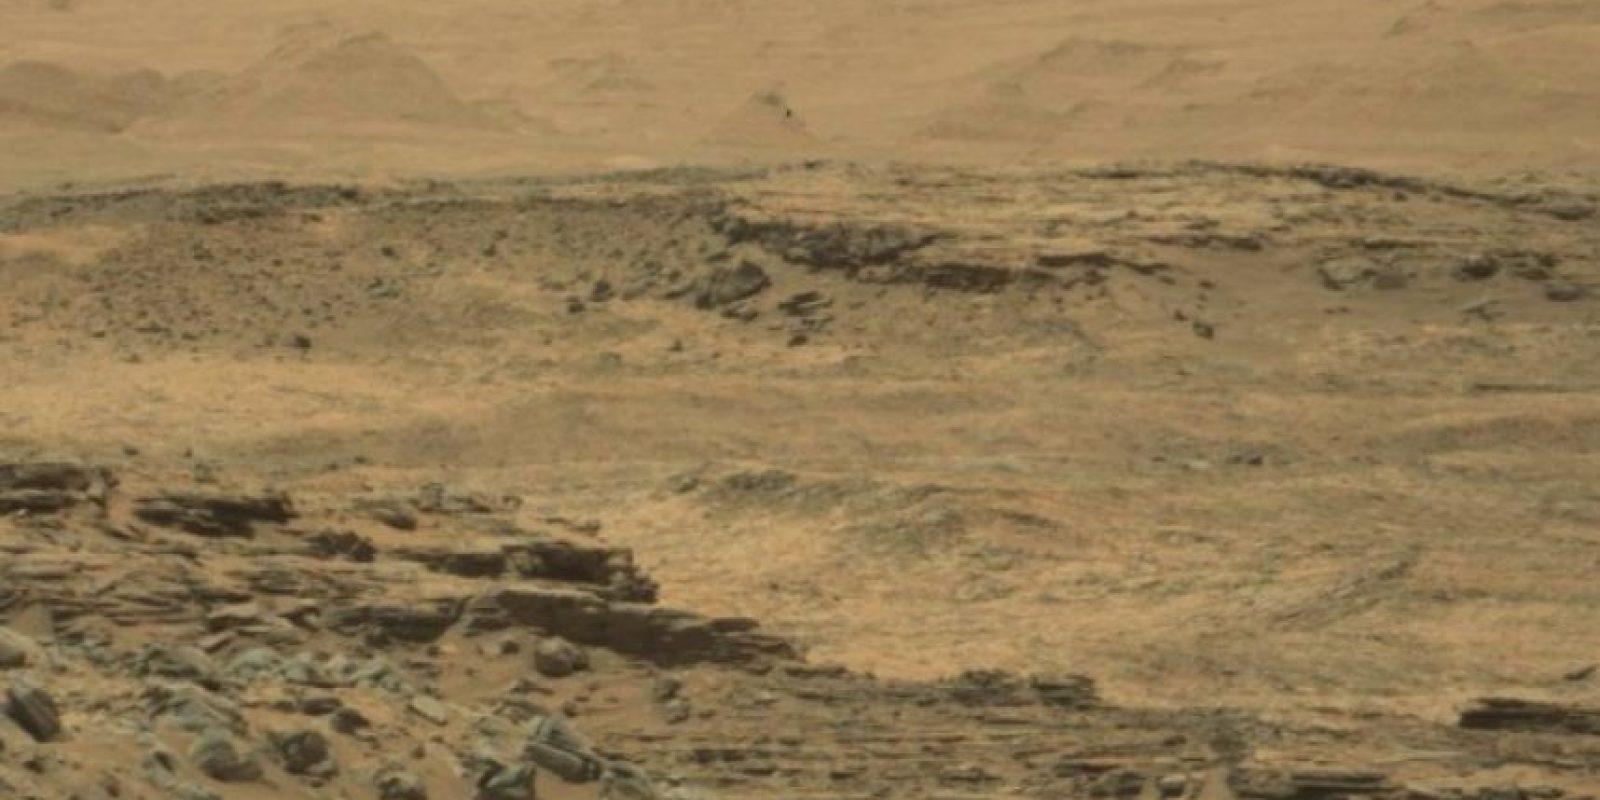 Y estas son las difundidas por la NASA Foto:original en http://mars.jpl.nasa.gov/msl-raw-images/msss/01074/mcam/1074MR0047260010600092E01_DXXX.jpg